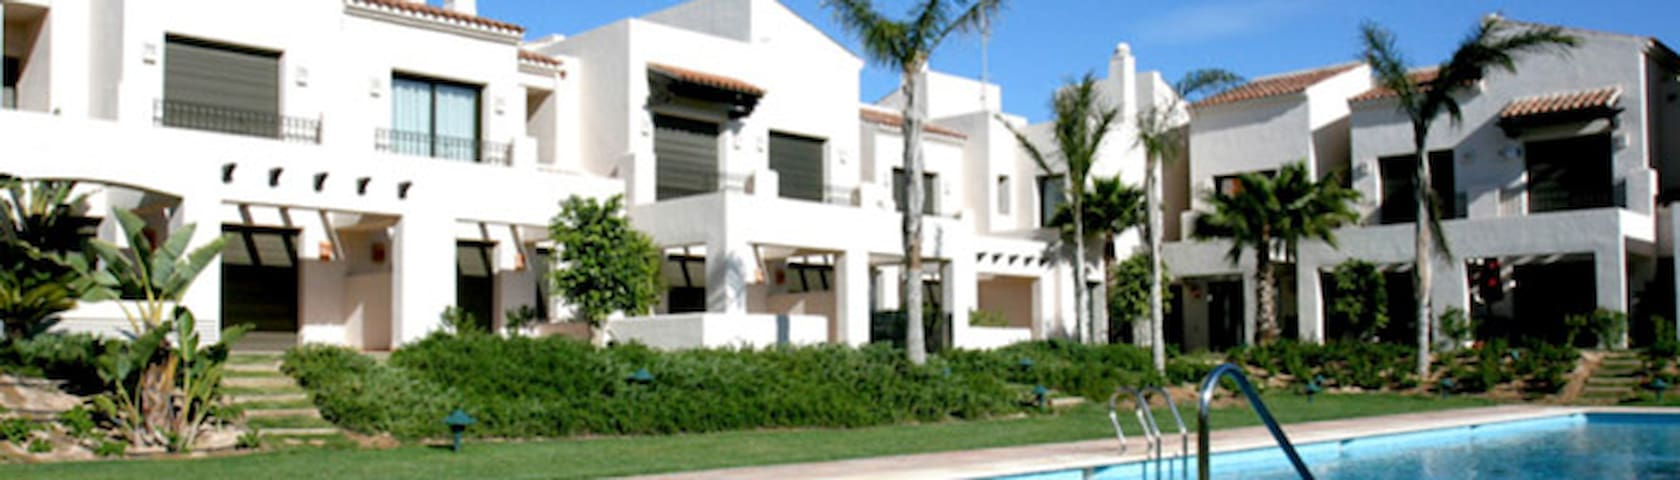 Adosado con Piscina  - San Javier - House